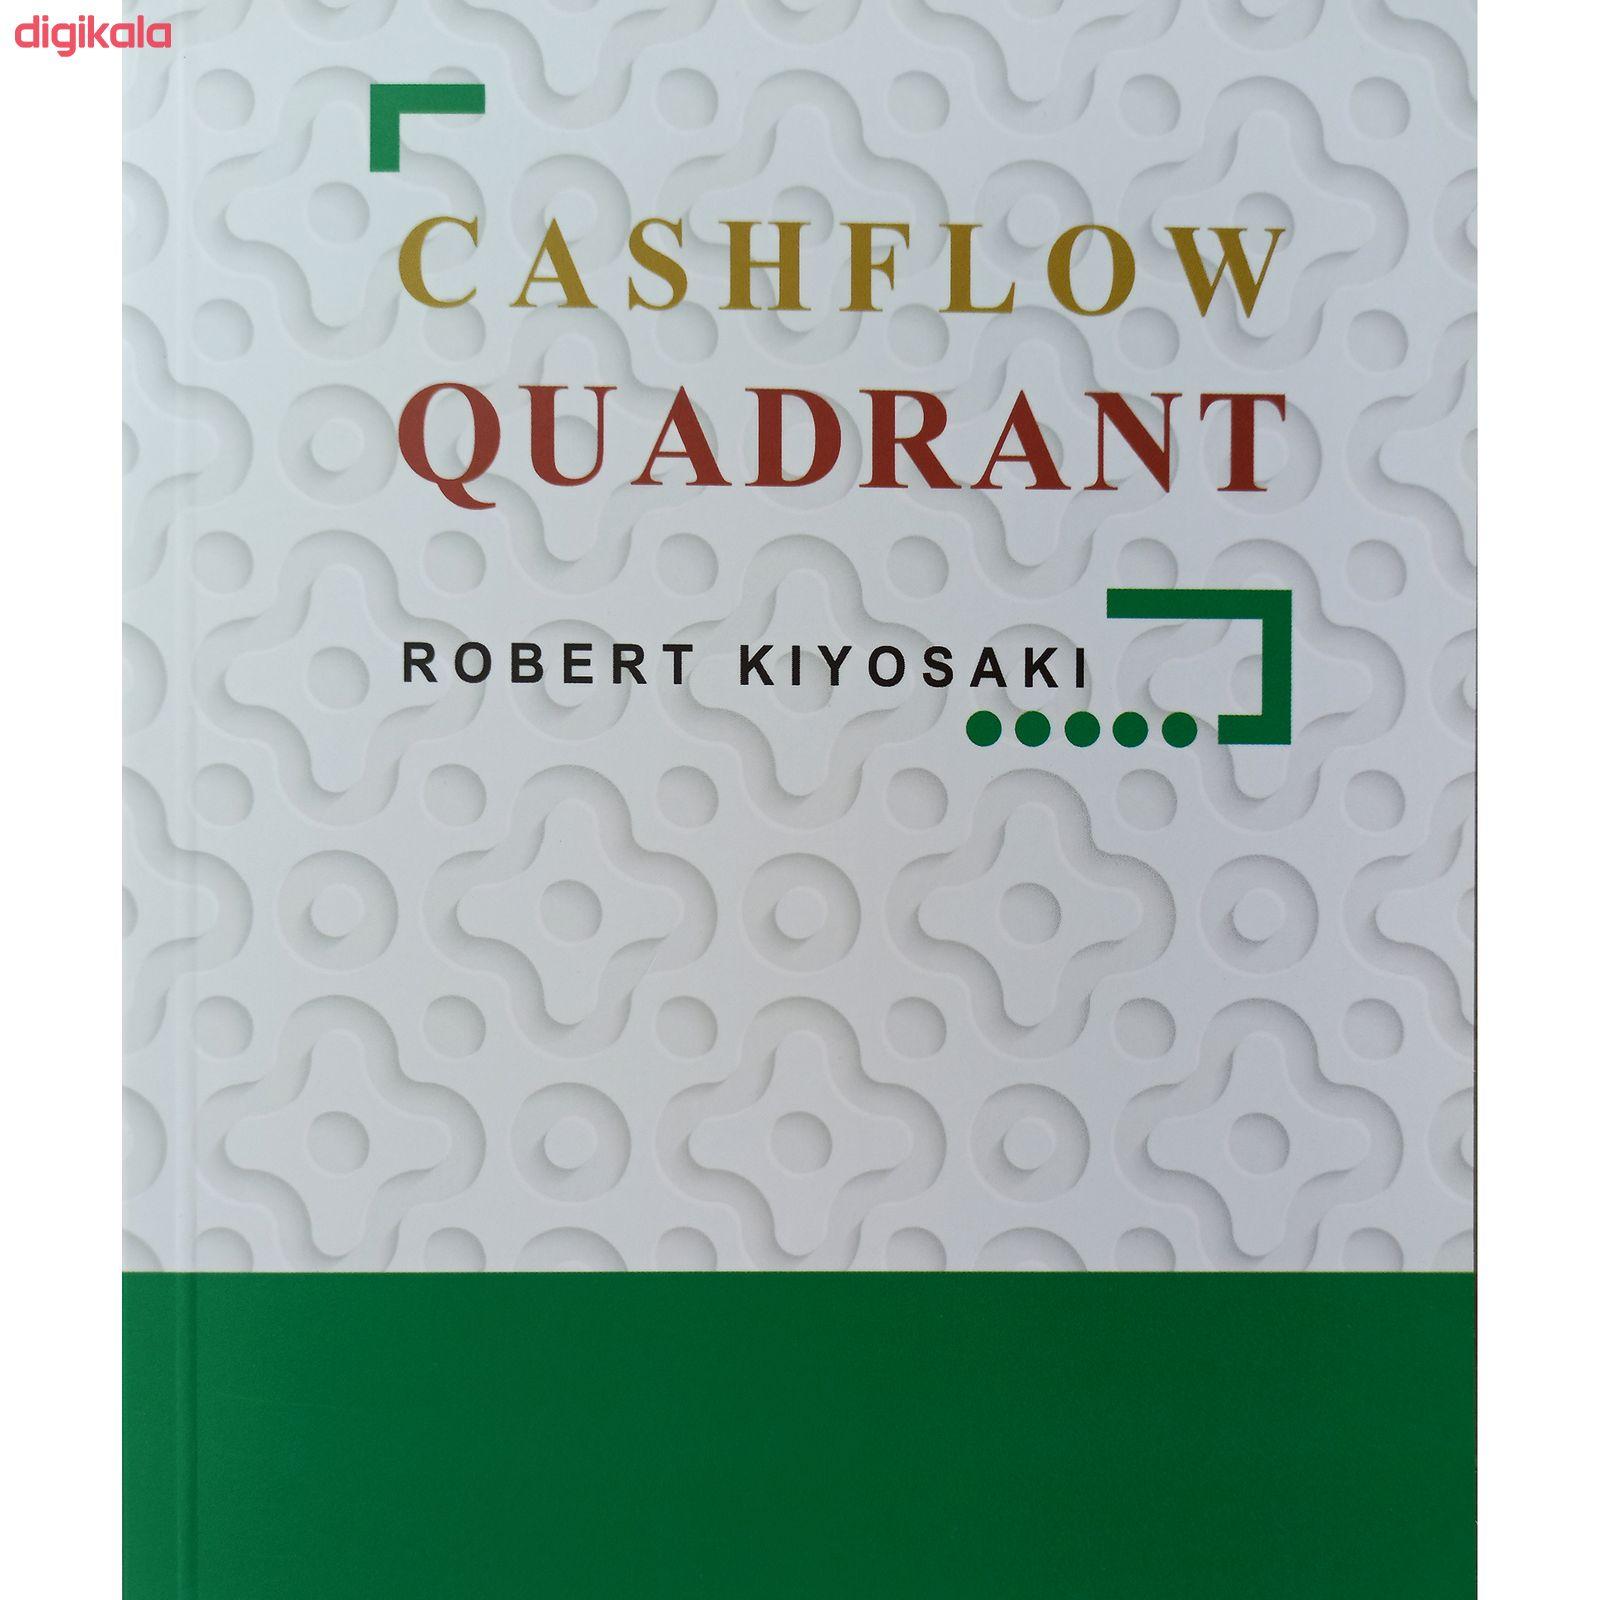 کتاب چهارراه پولسازی اثر رابرت کیوساکی نشر ریواس main 1 1